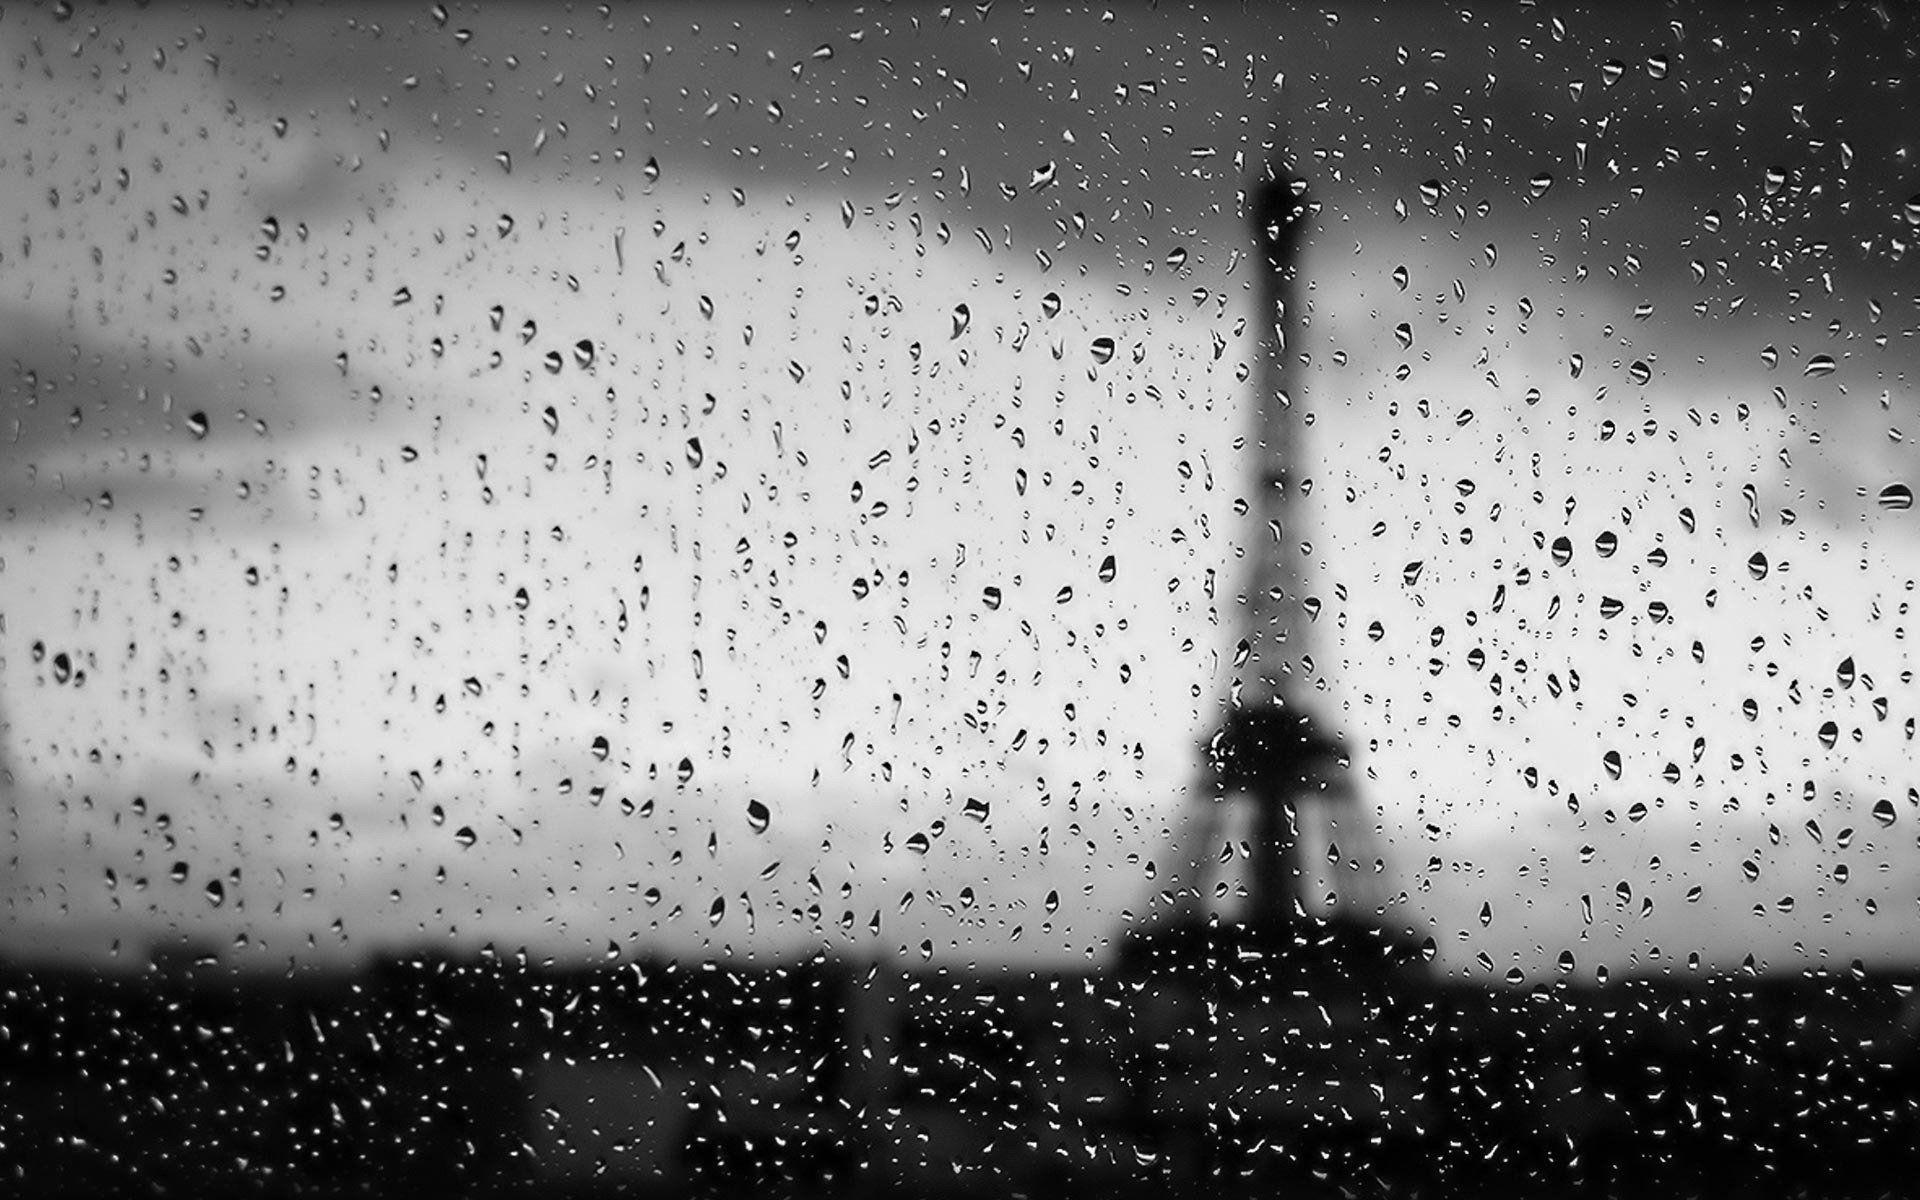 Pin By Kephren Knitting Studio On Rain Rain Wallpapers Rain Photography City Rain